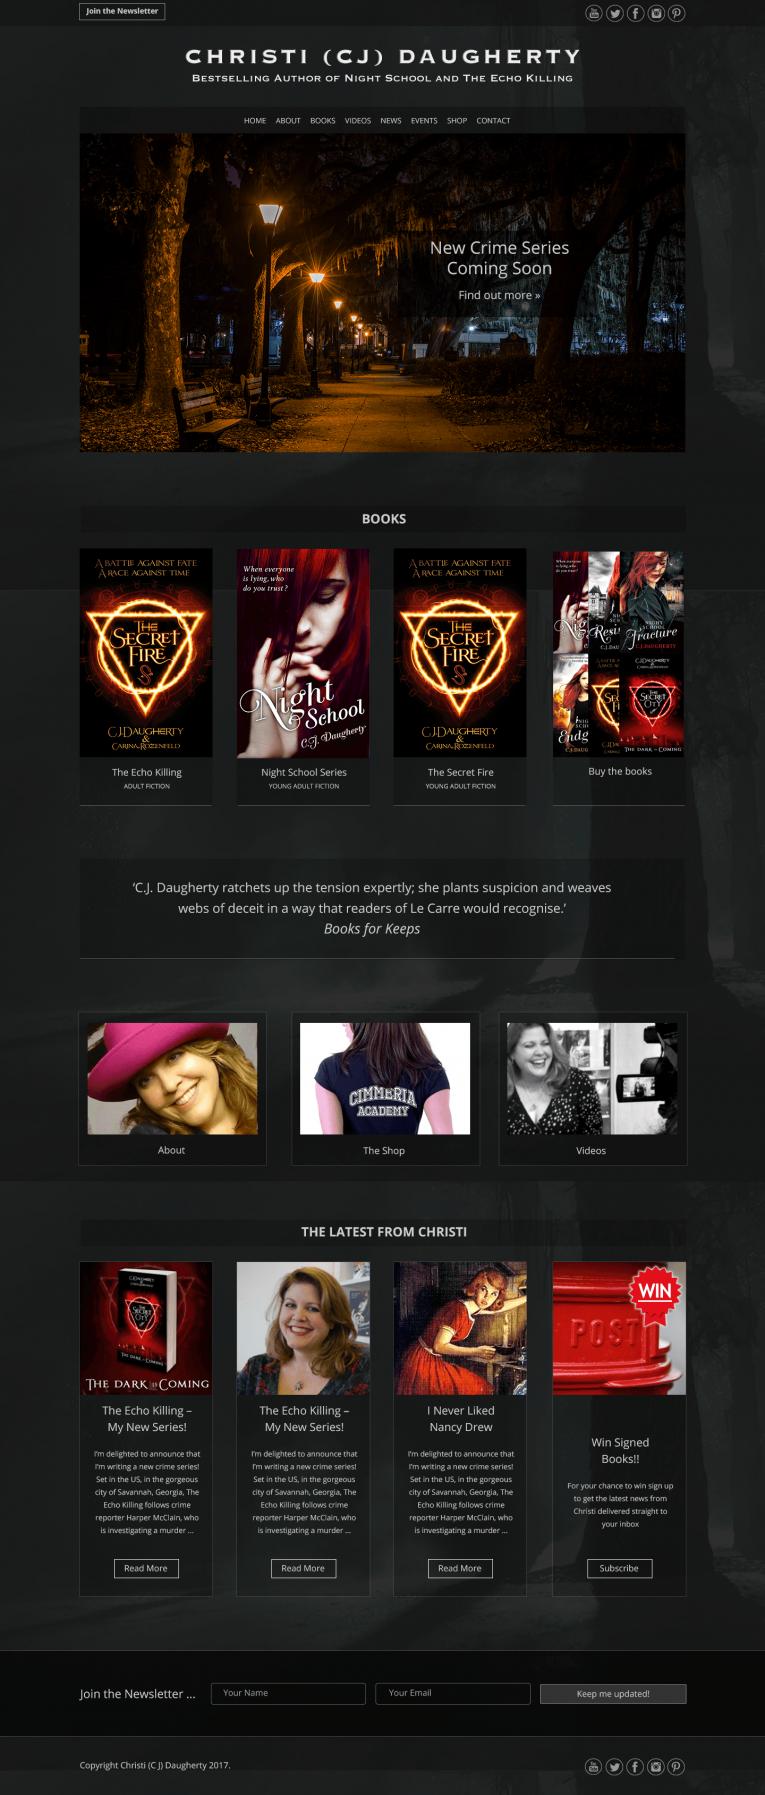 Christi Daugherty desktop homepage design